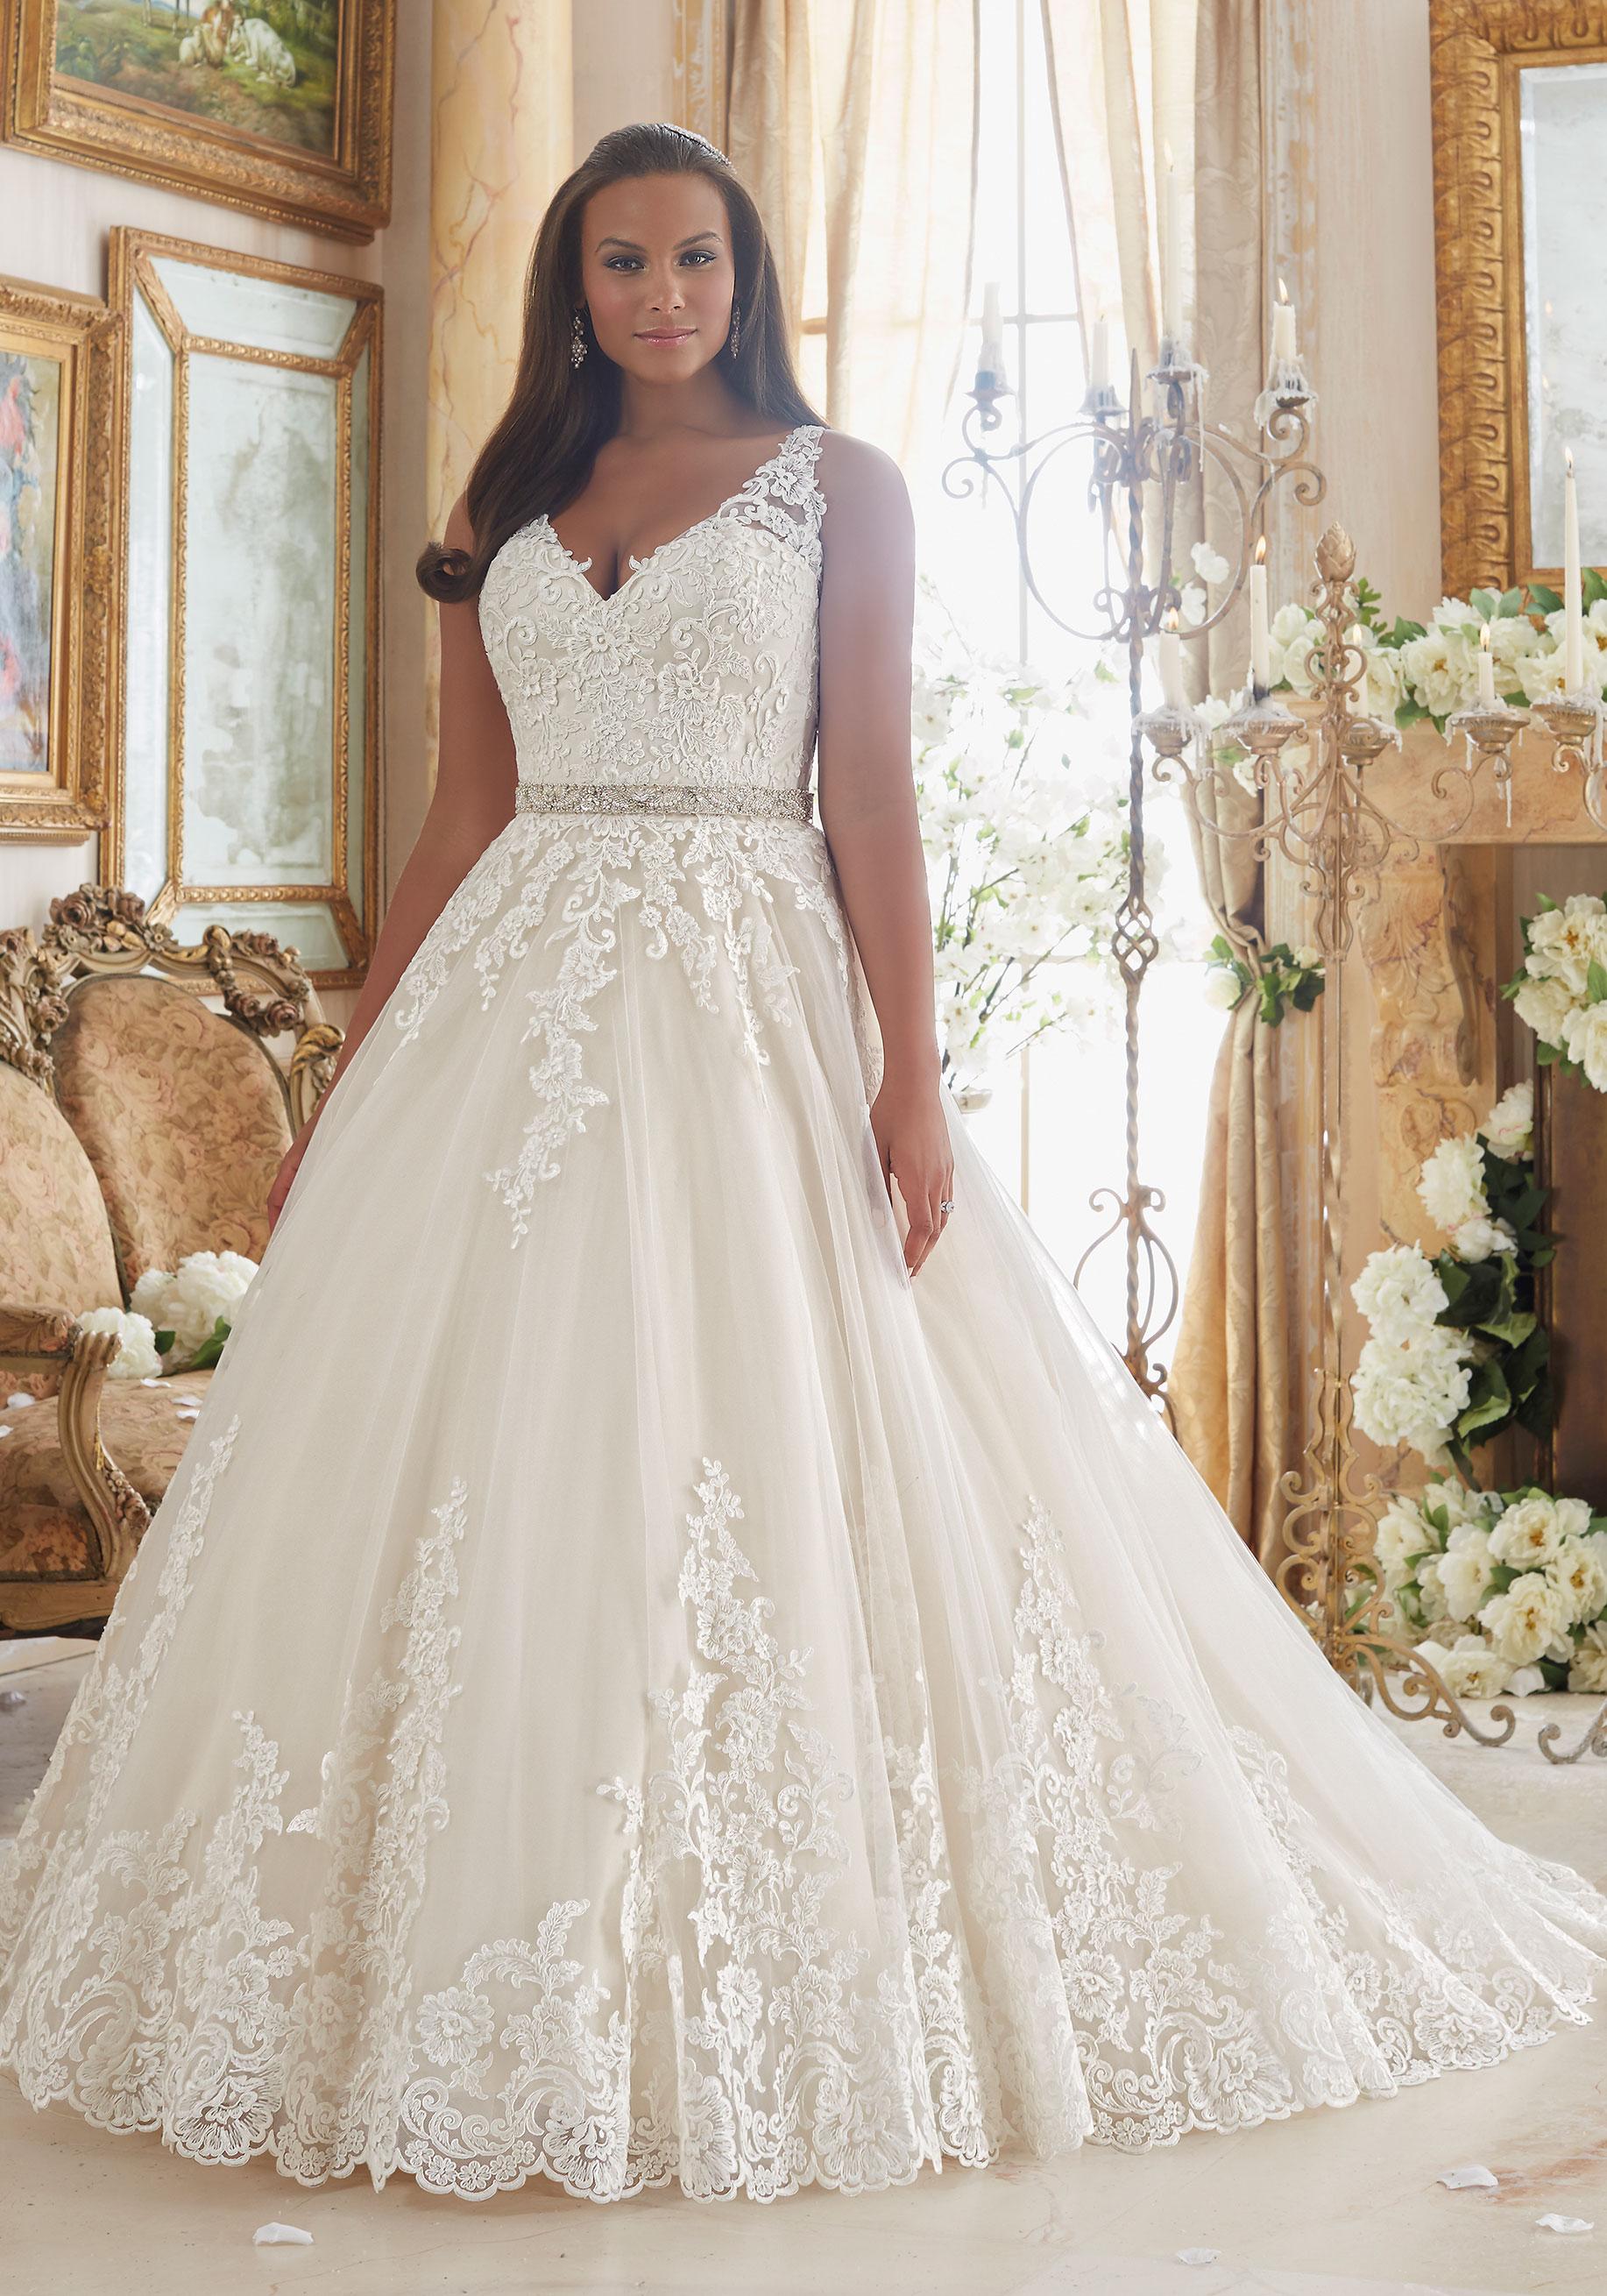 Size 20 Bridesmaid Dresses Uk Off 65 Www Daralnahda Com